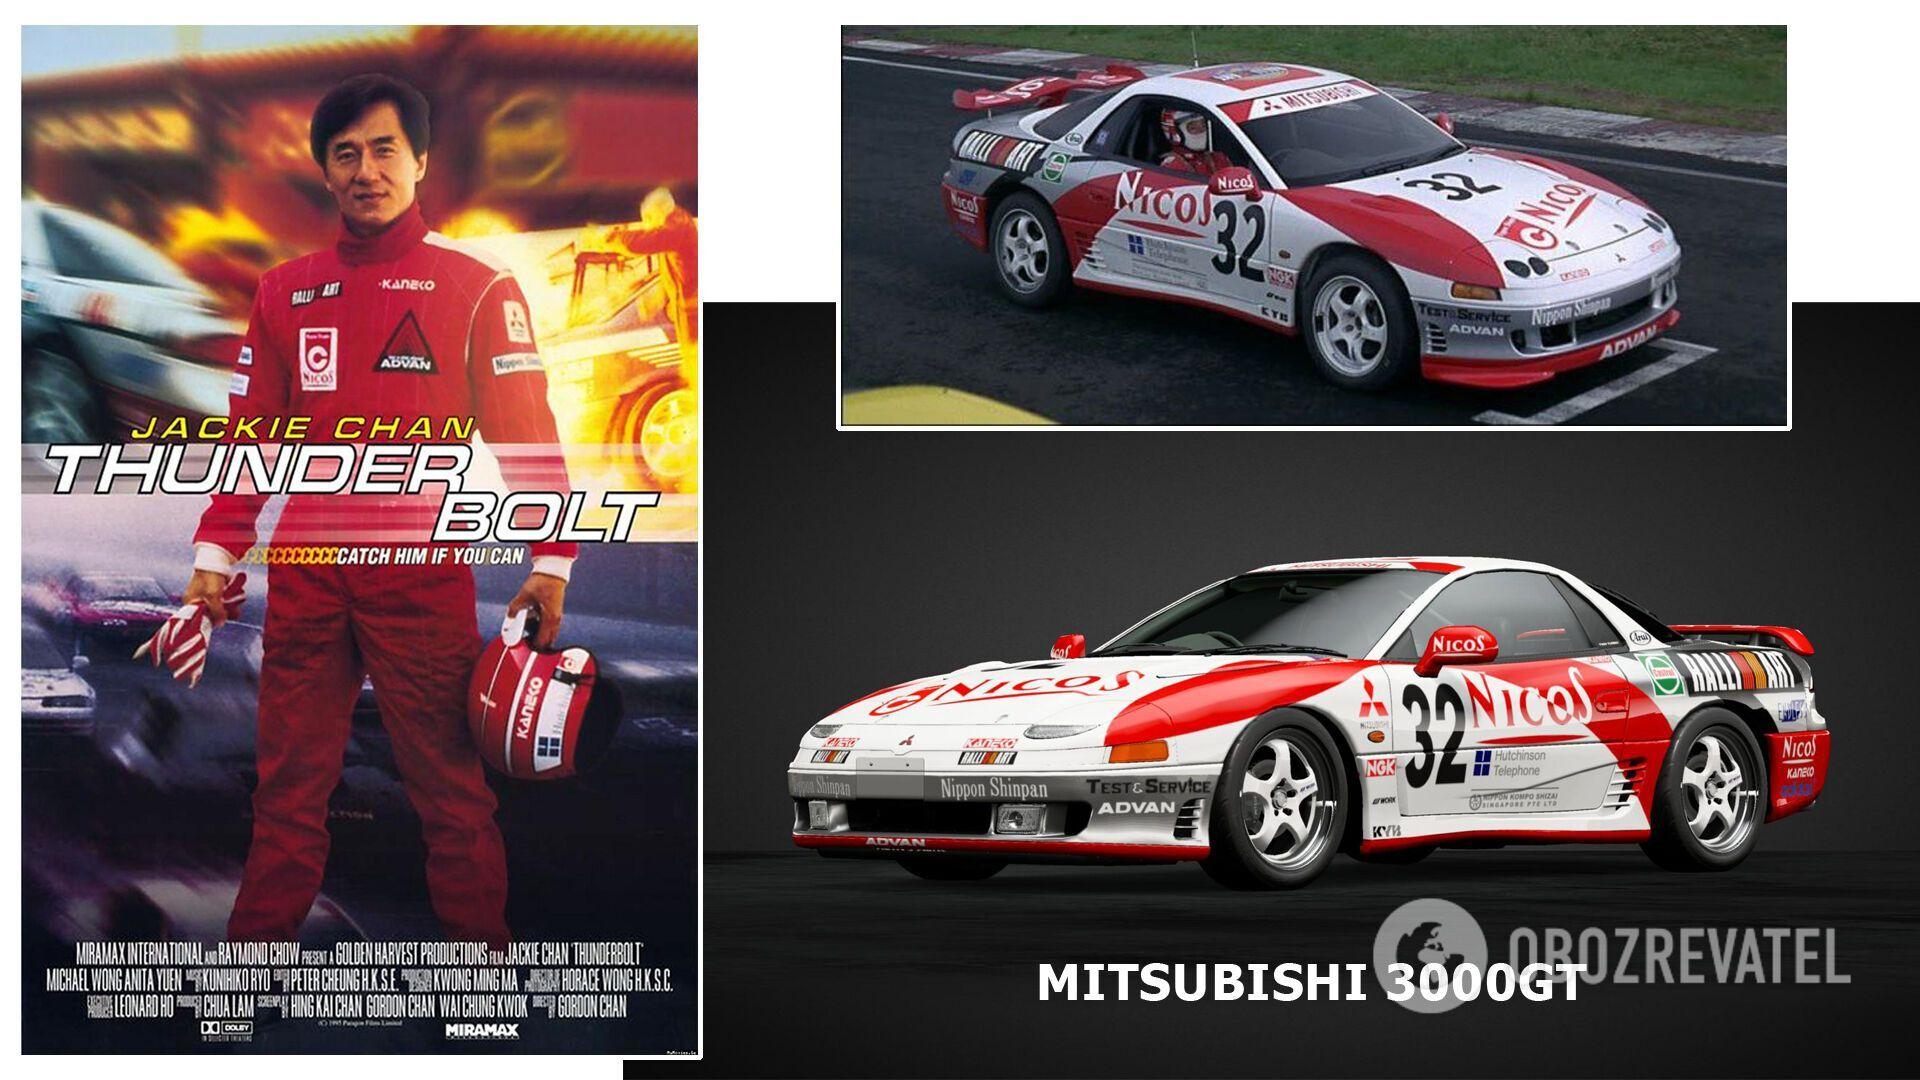 "Mitsubishi 3000GT в 1995 году снимался вместе с Джеки Чаном в боевике ""Удар молнии"""